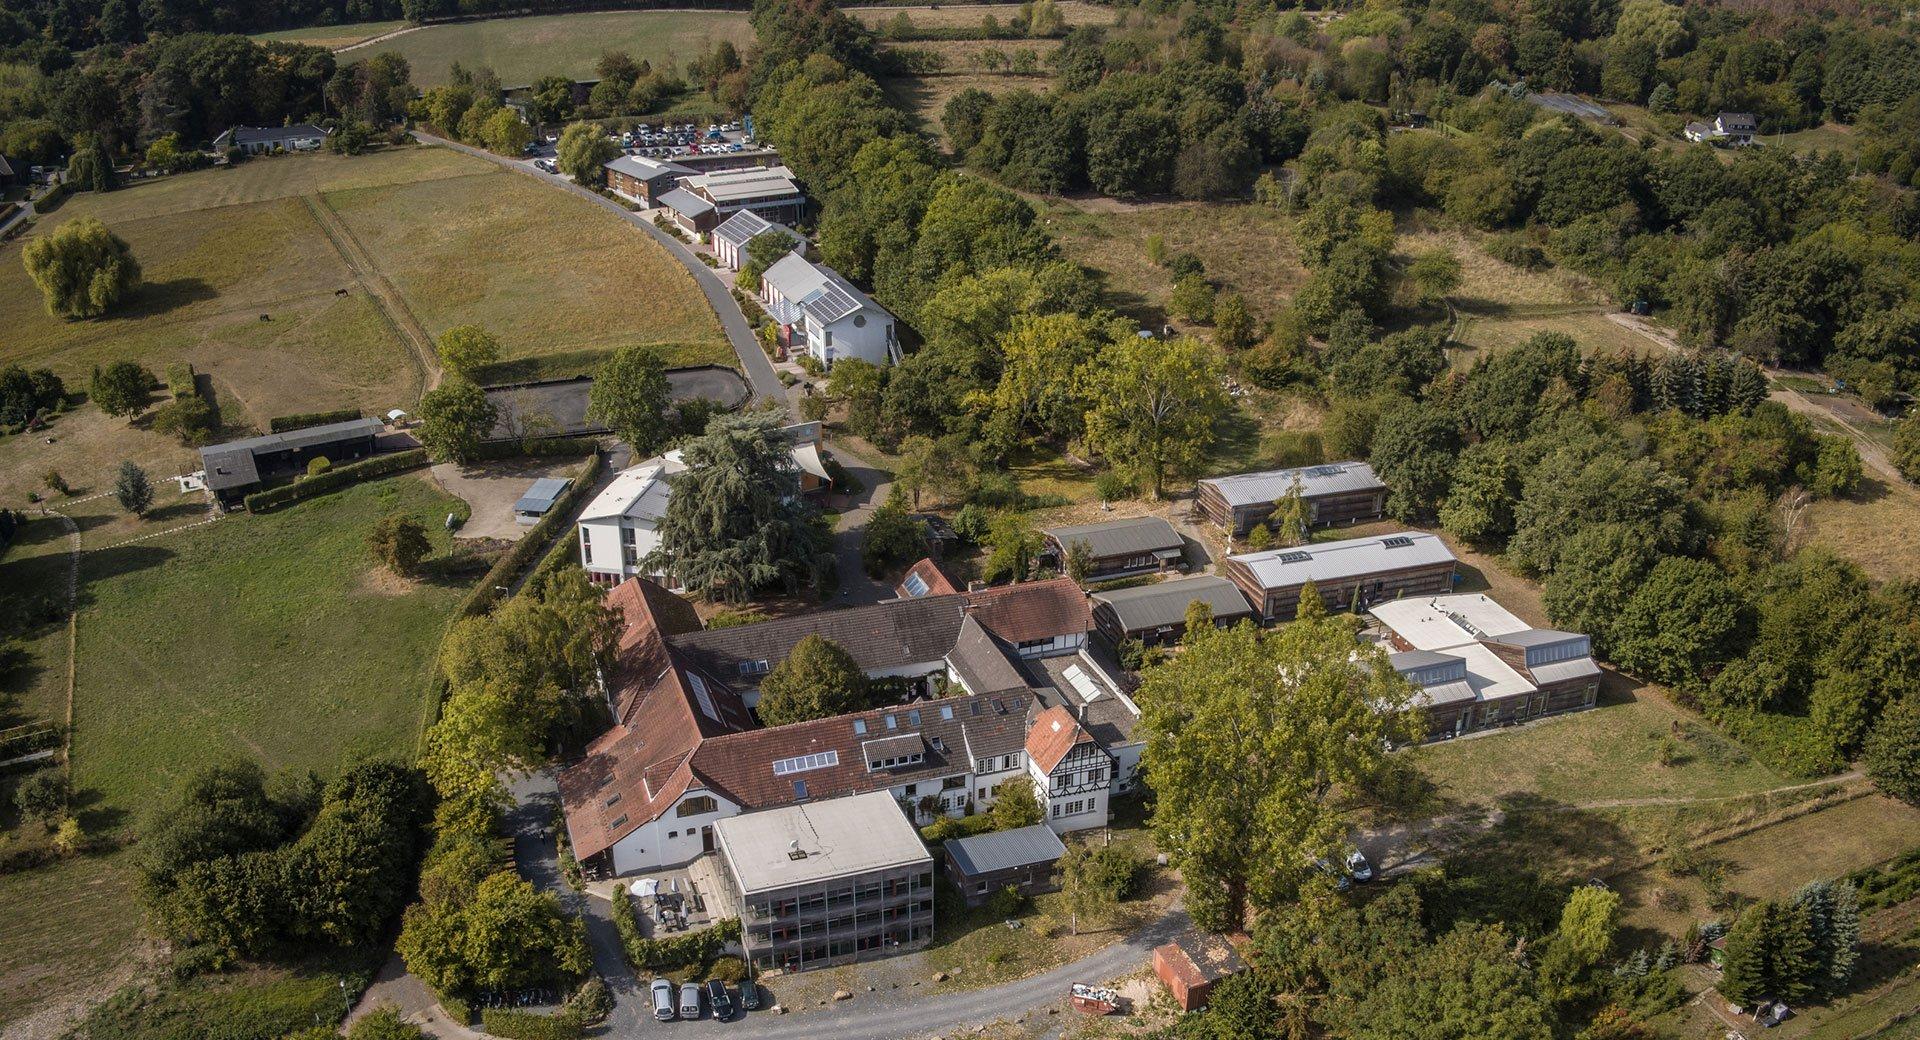 Luftbild der Alanus Hochschule Campus I